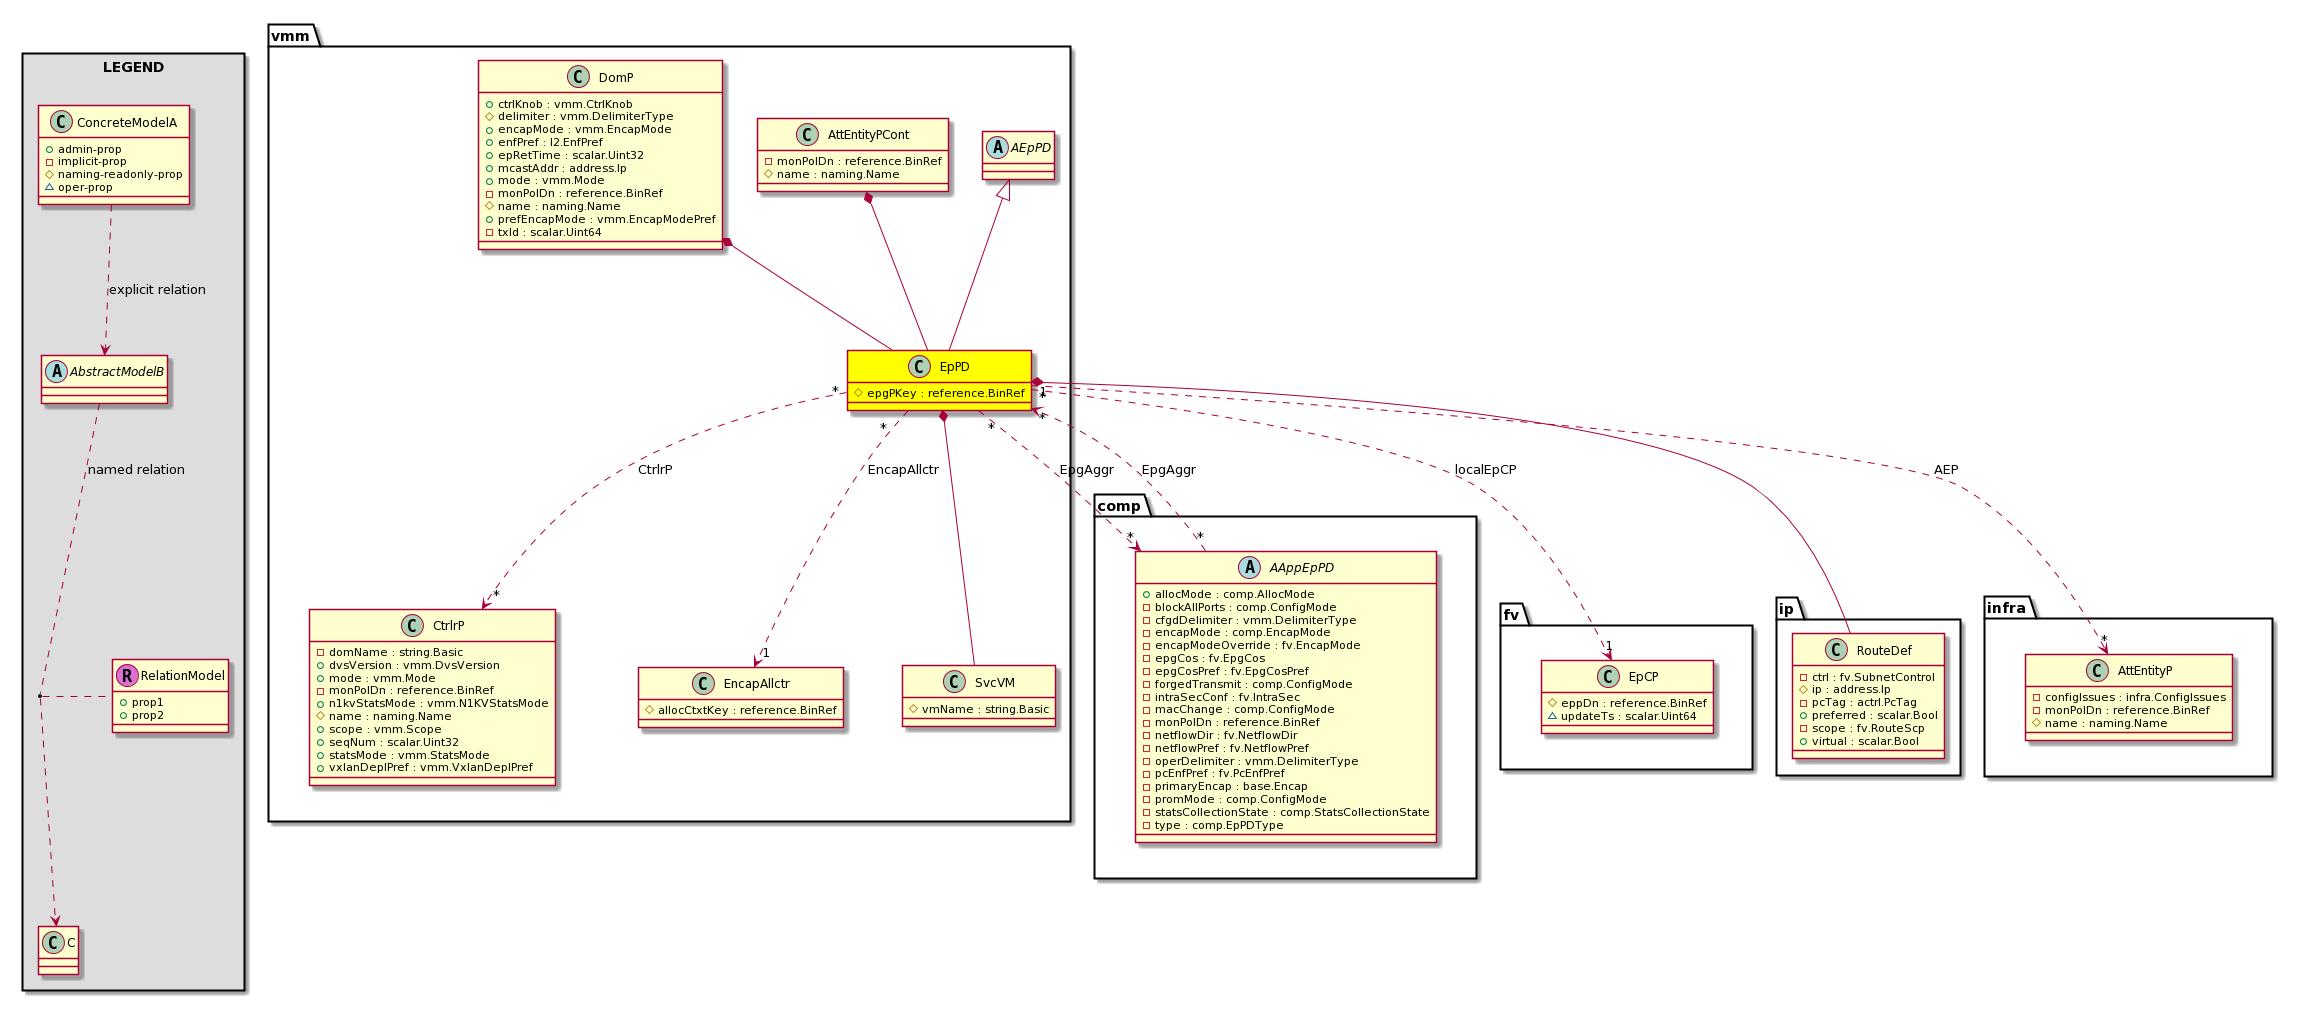 Cisco System Model: Classvmm:EpPD